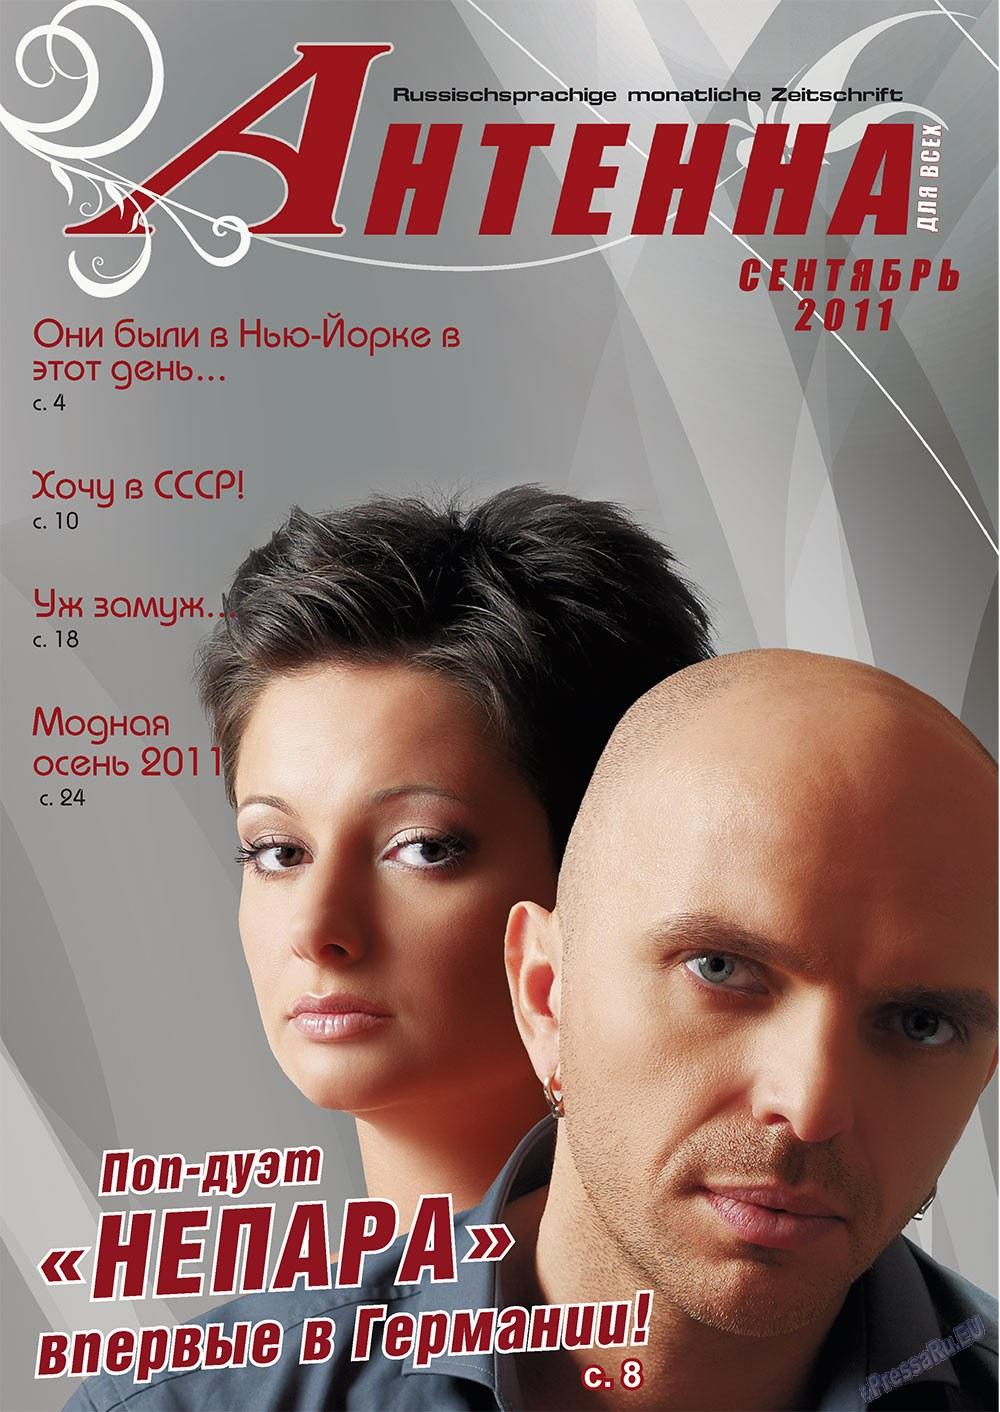 Антенна (журнал). 2011 год, номер 9, стр. 1